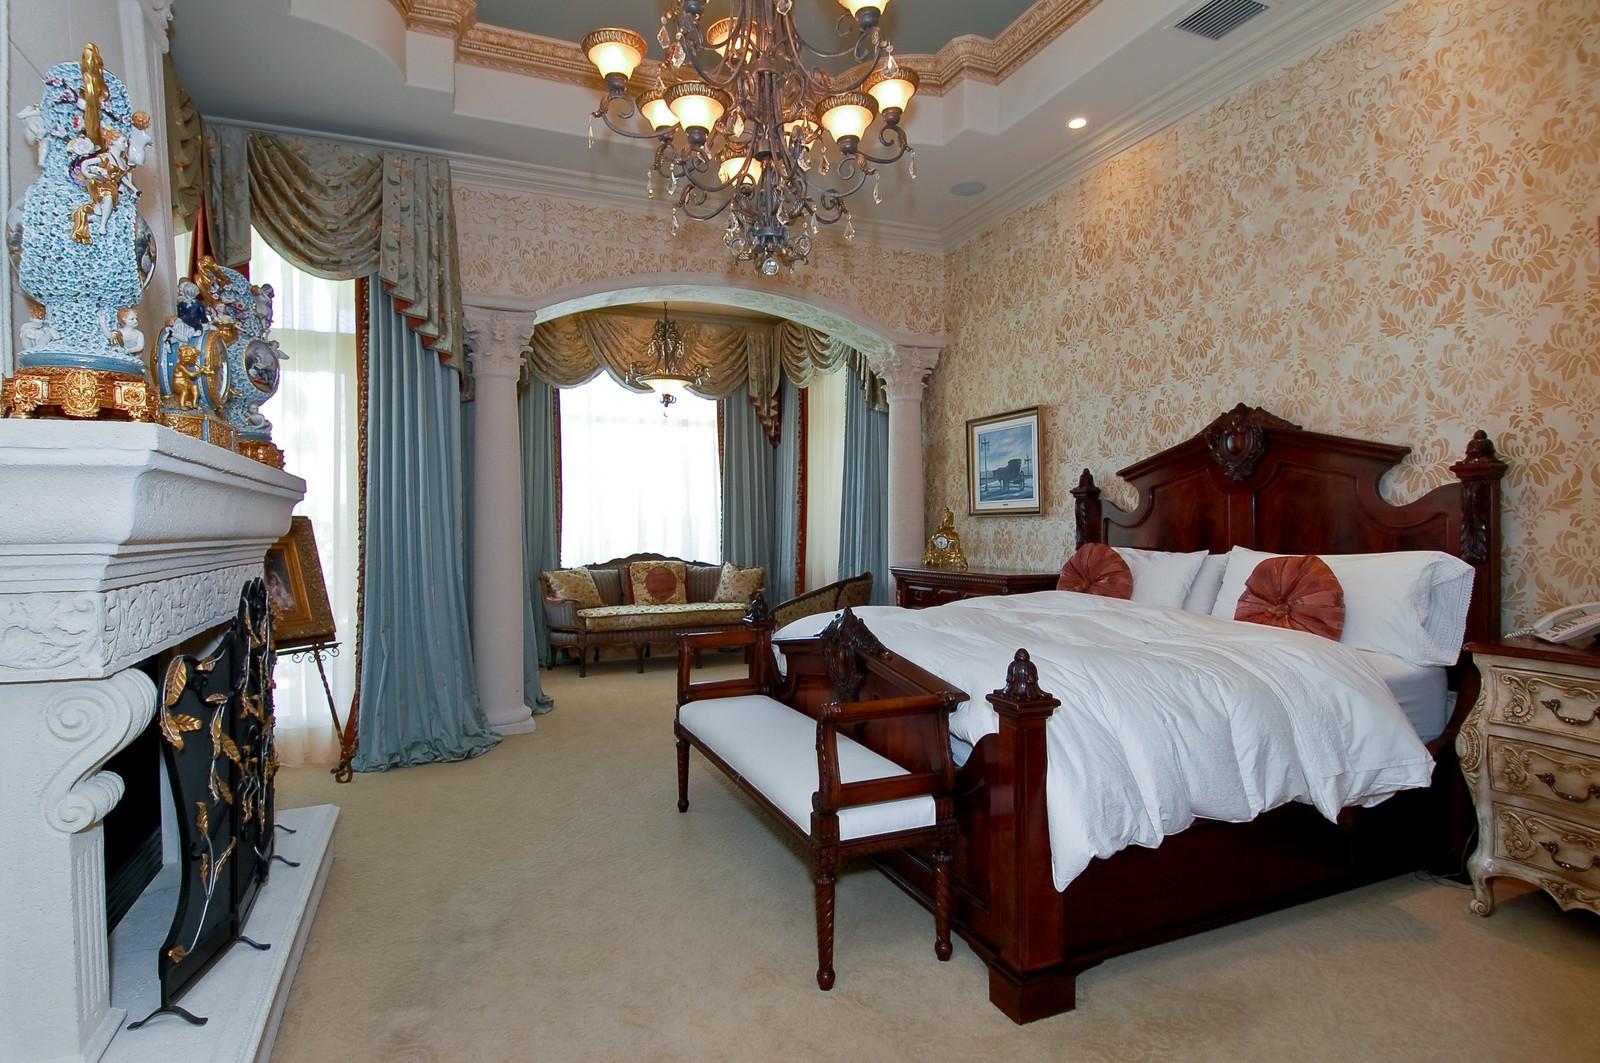 Real Estate Photography - 215 Royal Palm Way, Boca Raton, FL, 33432 - Master Bedroom